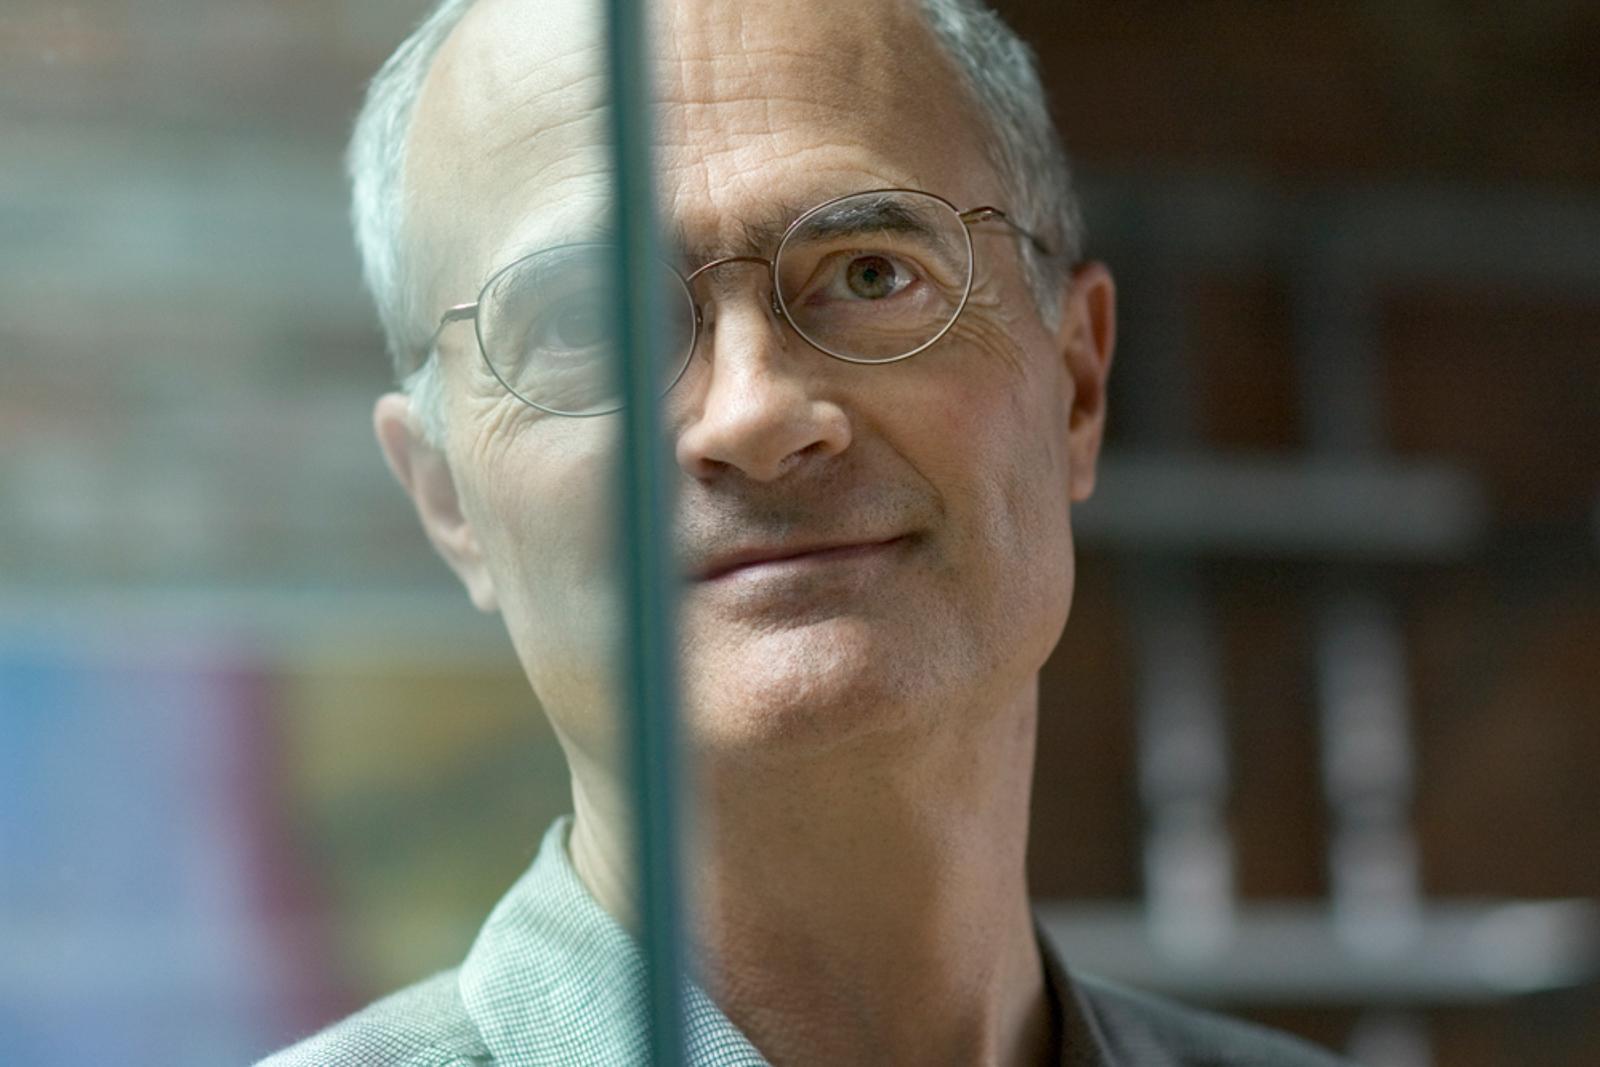 Portrait of older man looking pensive, seen through glass